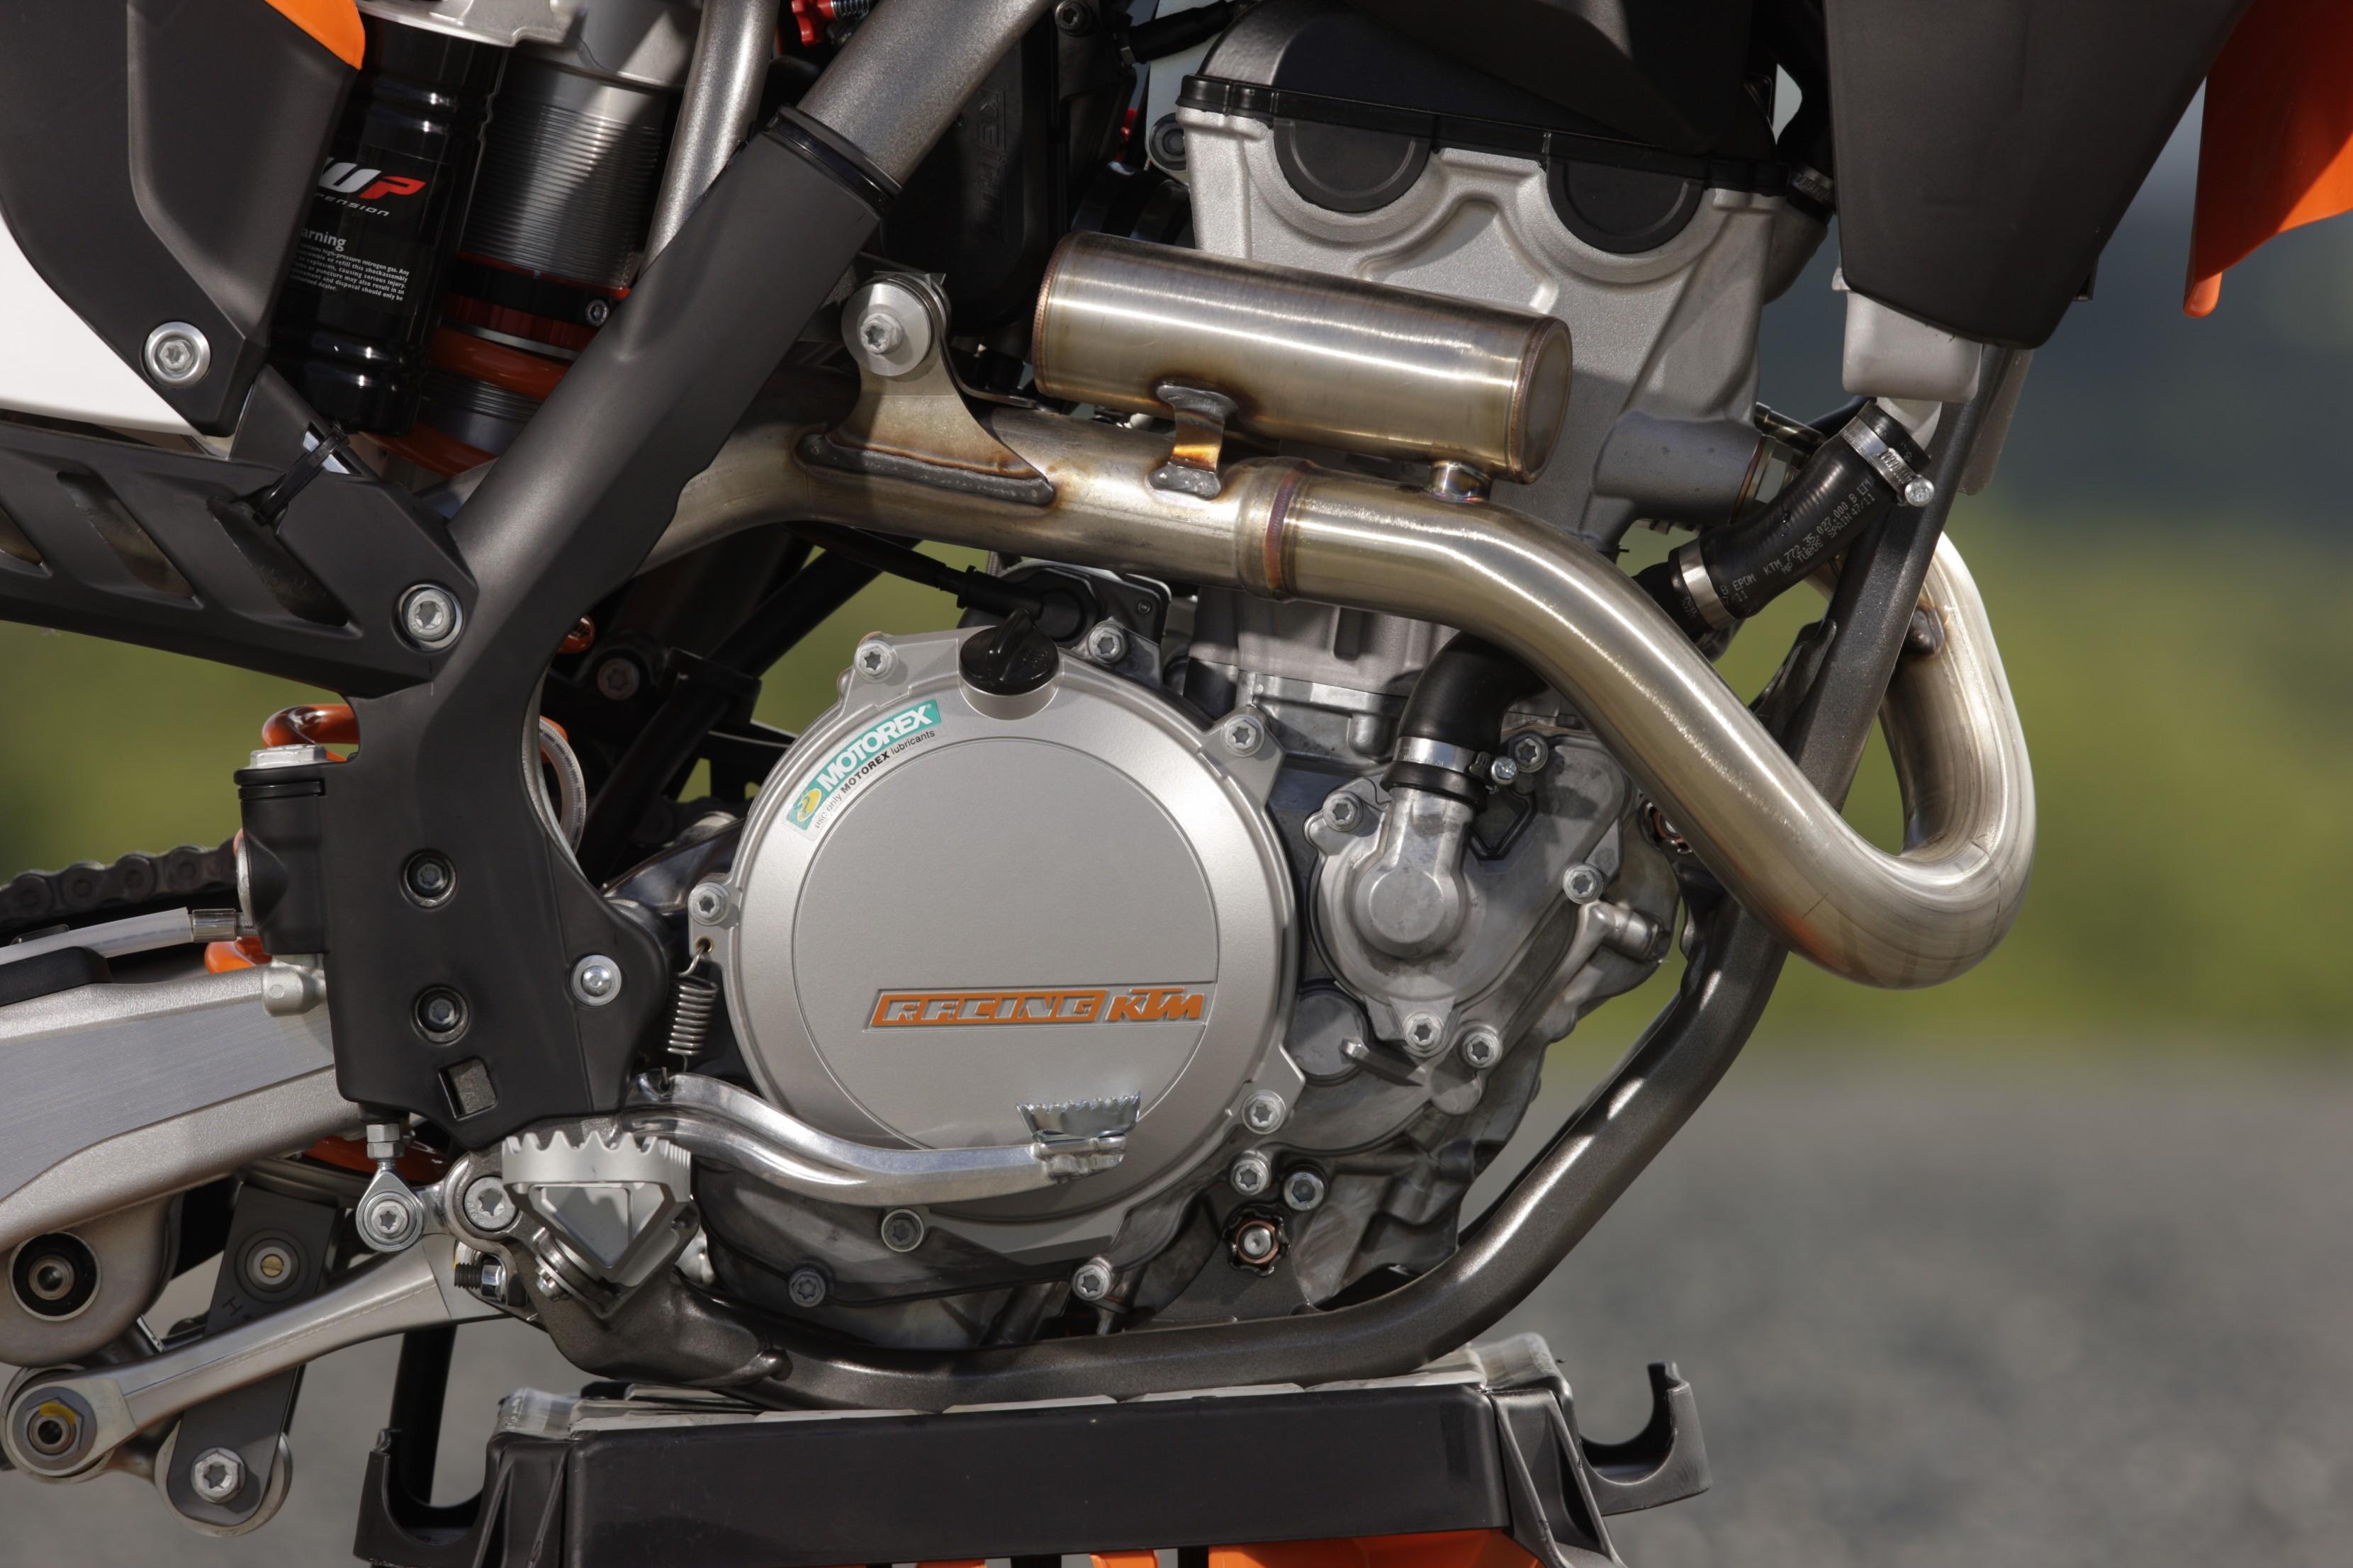 The Heart Of A Bike Ktm Engine Builder Talks Blog 350 Diagram Piston Share